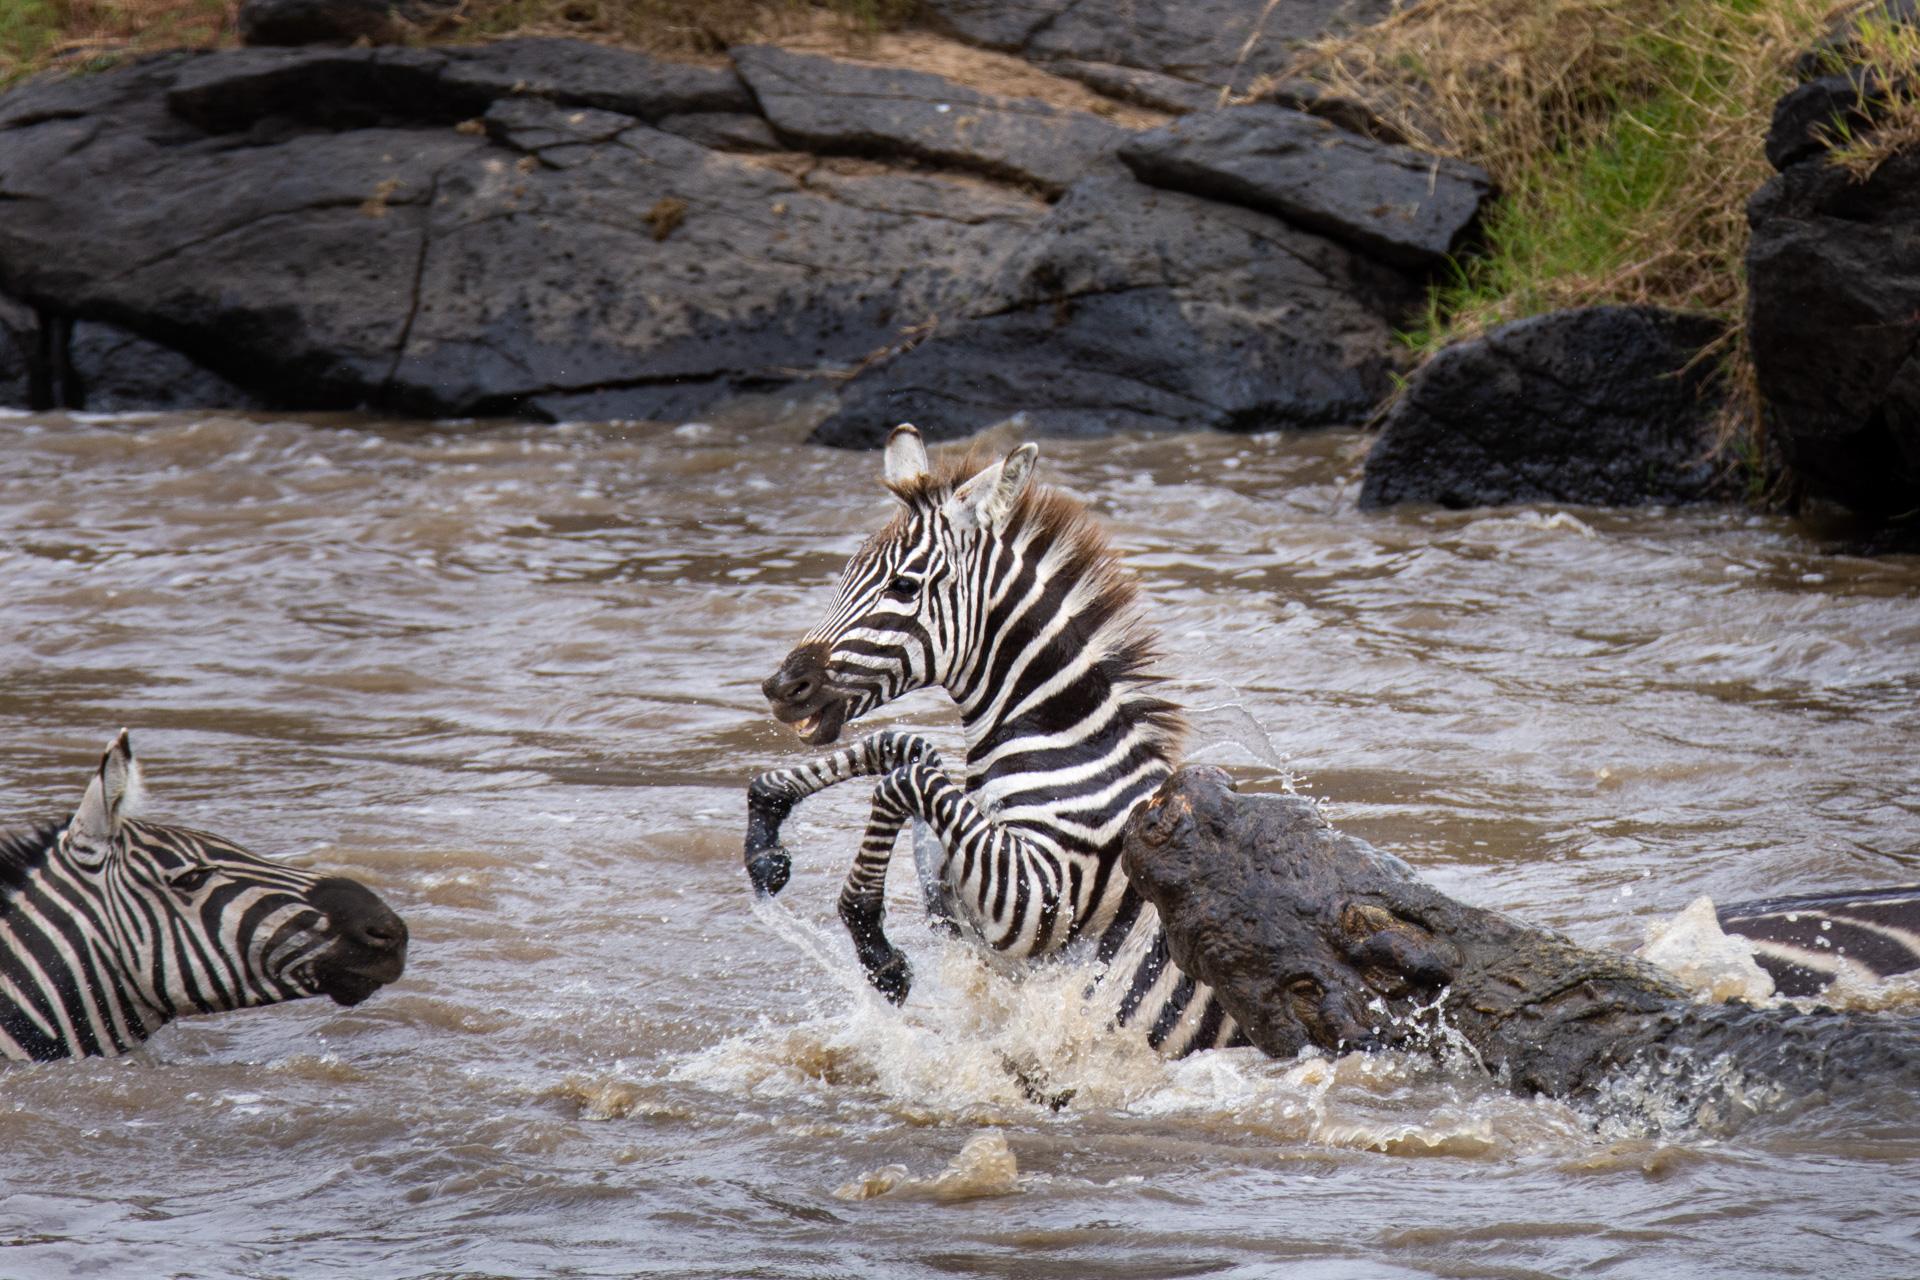 Zebra baby and croc